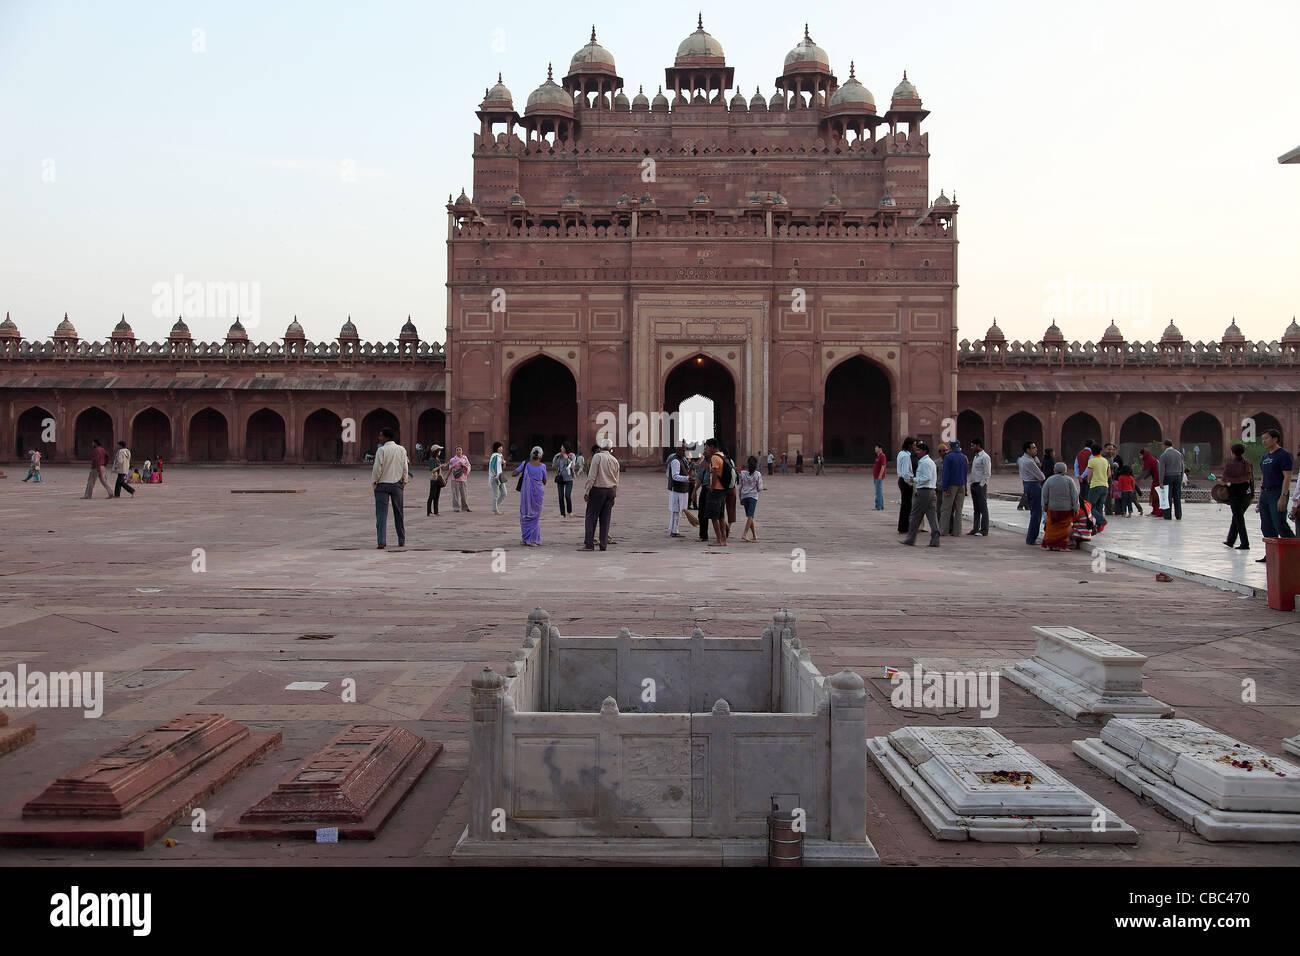 Fatehpur Sikri,architettura Indo-Islamic,architettura indiana,luogo turistico,l'architettura,sabbia rossa pietra,l'India. Immagini Stock